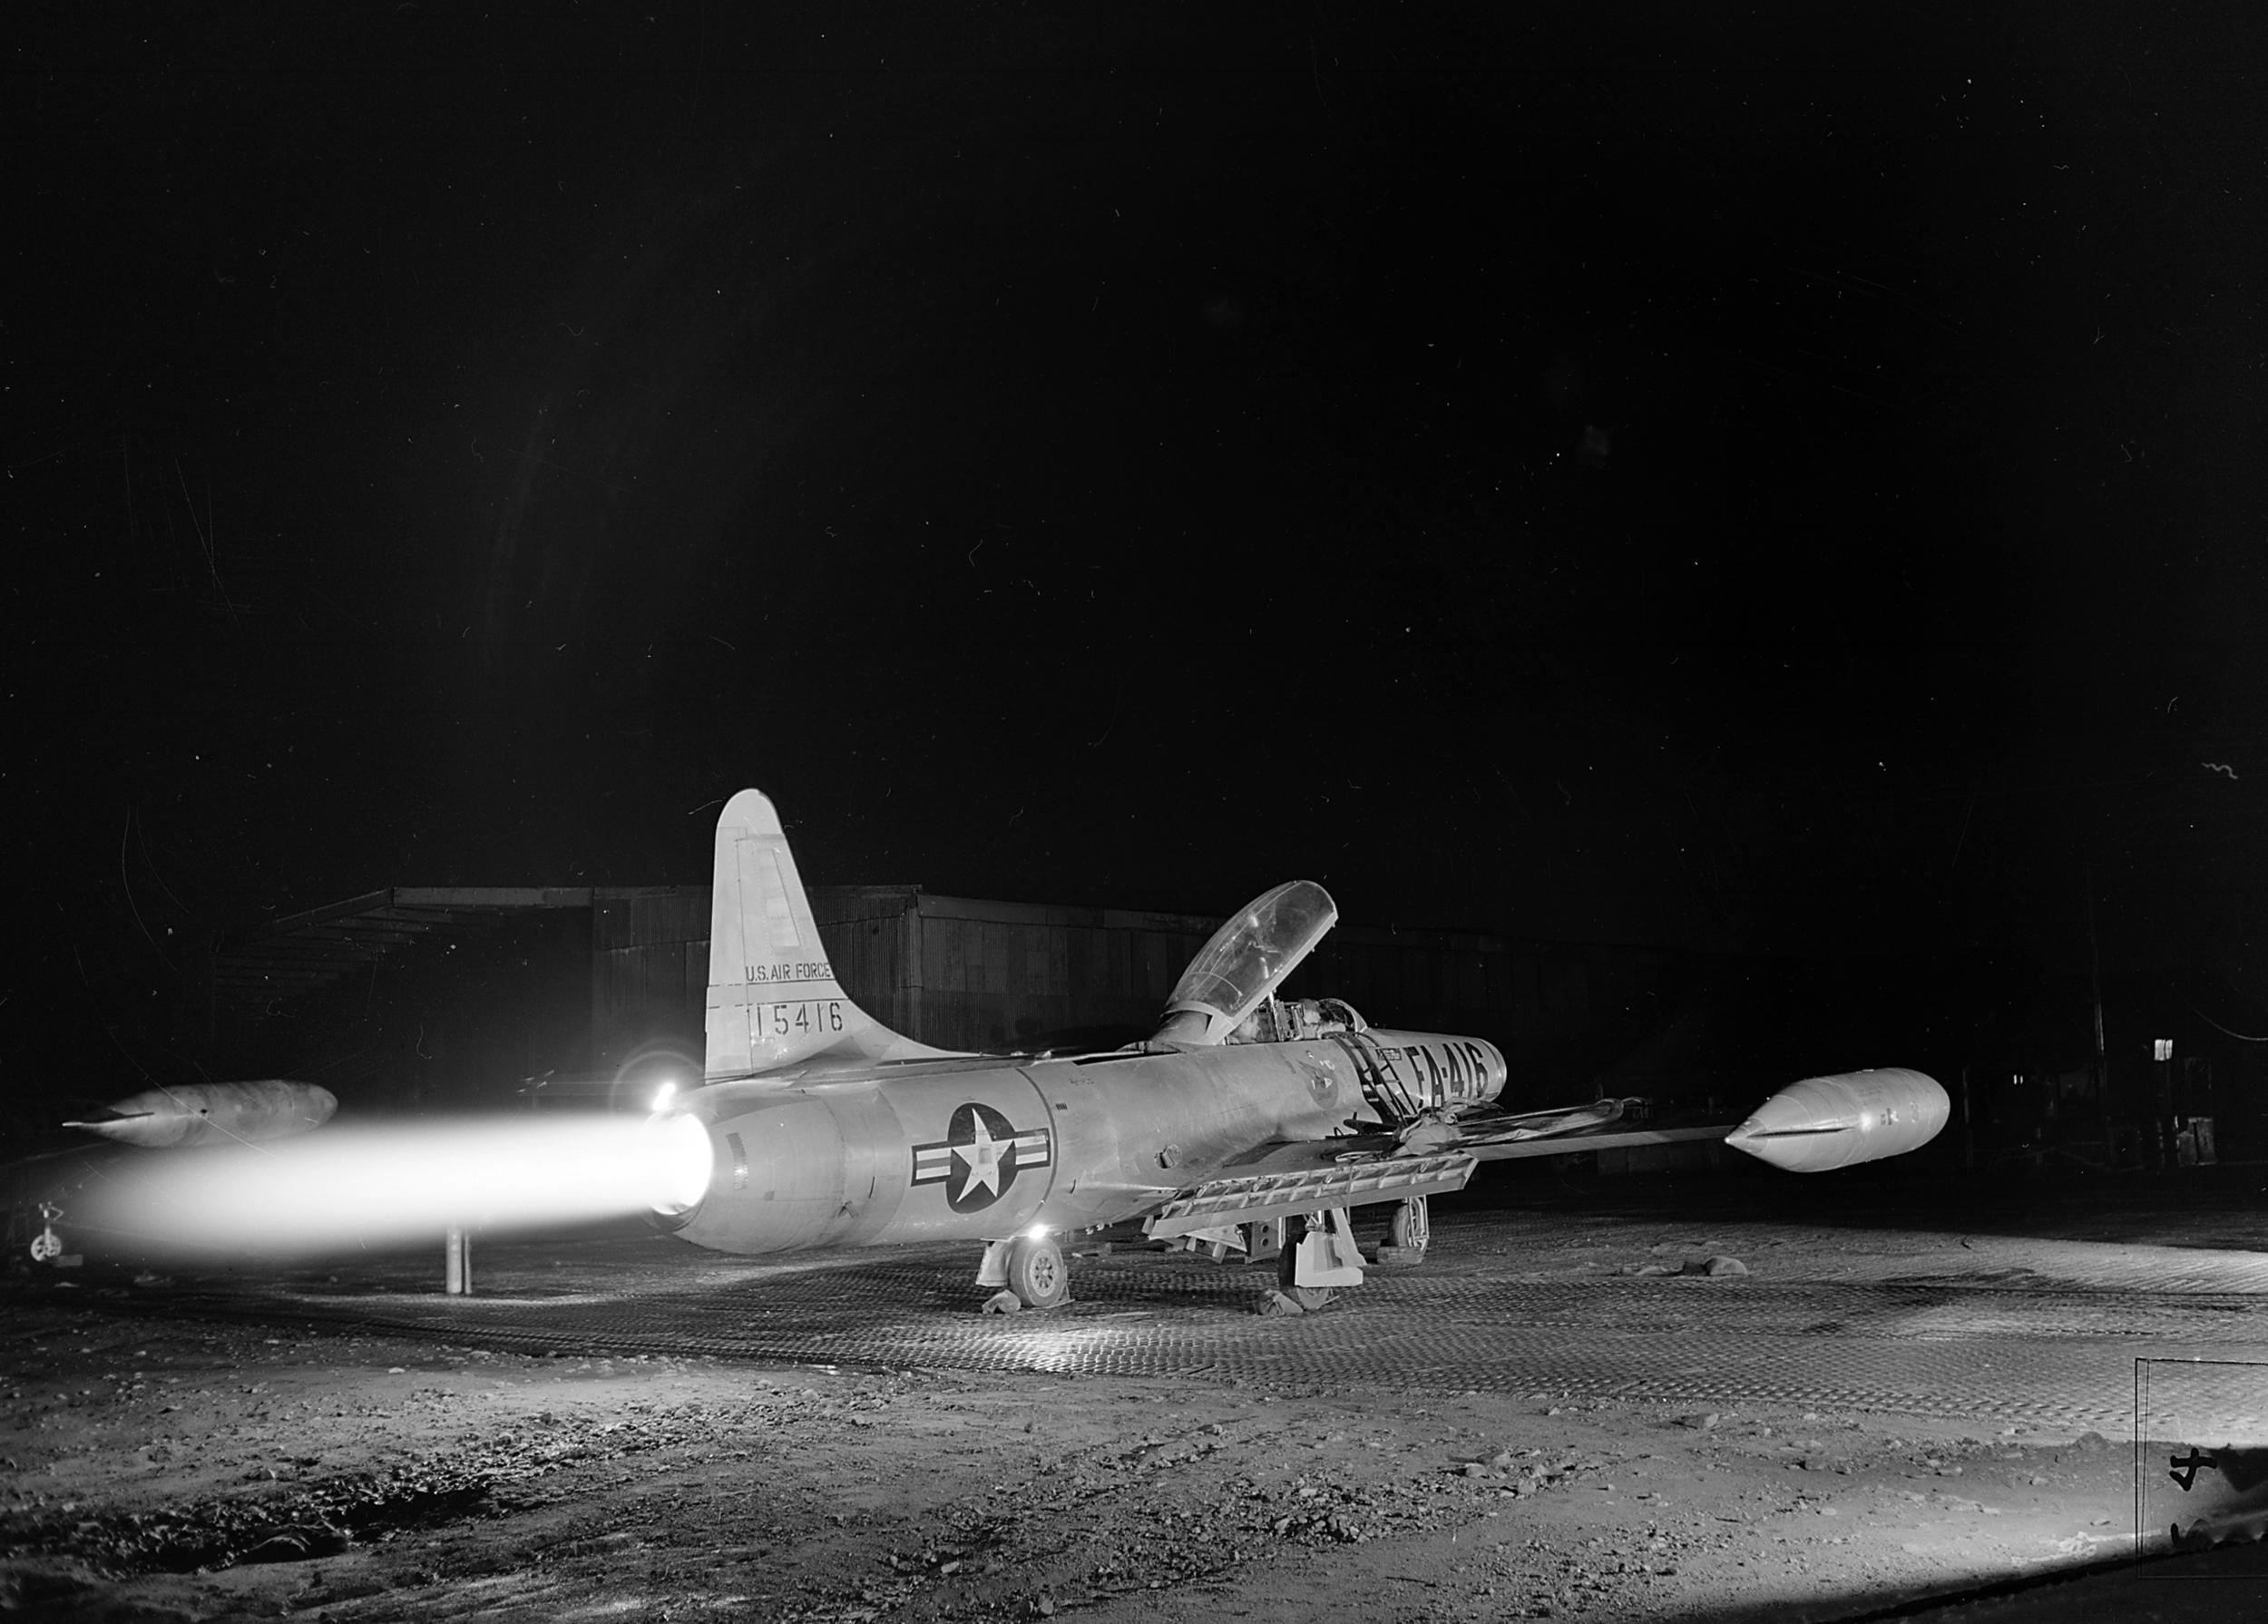 F-94B_319th_FIS_with_afterburner_Korea_1953.jpg